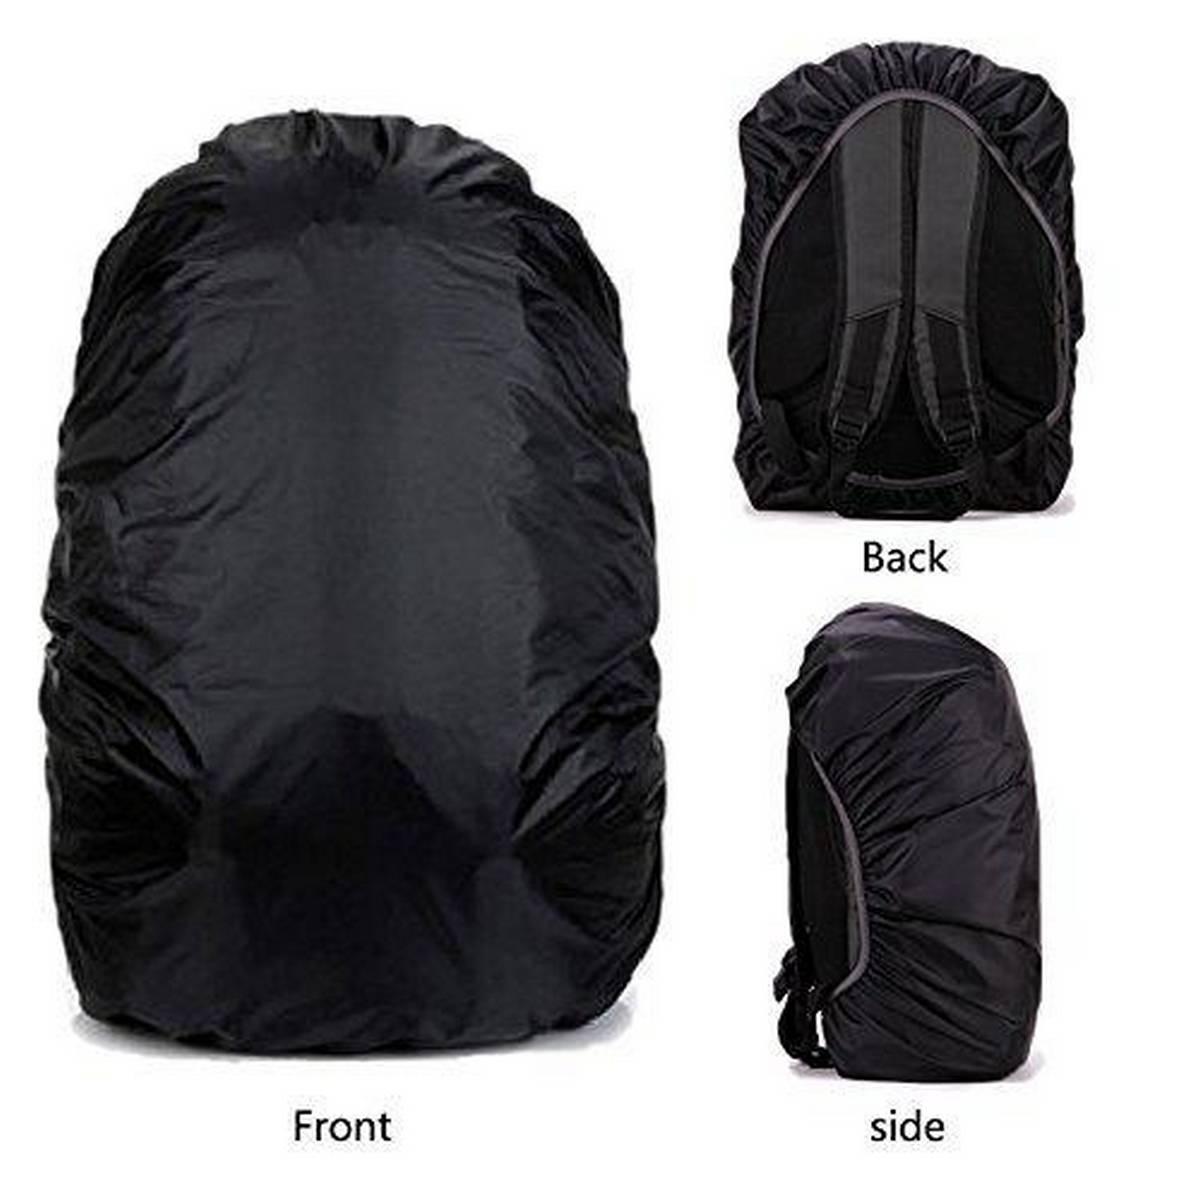 Rain cover AYAMAYA Waterproof Backpack Rain Cover (30L-40L), Lightweight Bag Rain Cover Elastic Adjustable Rucksack Raincover Rainproof Dustproof Daypack Cover Ideal for Cycling Hiking Camping